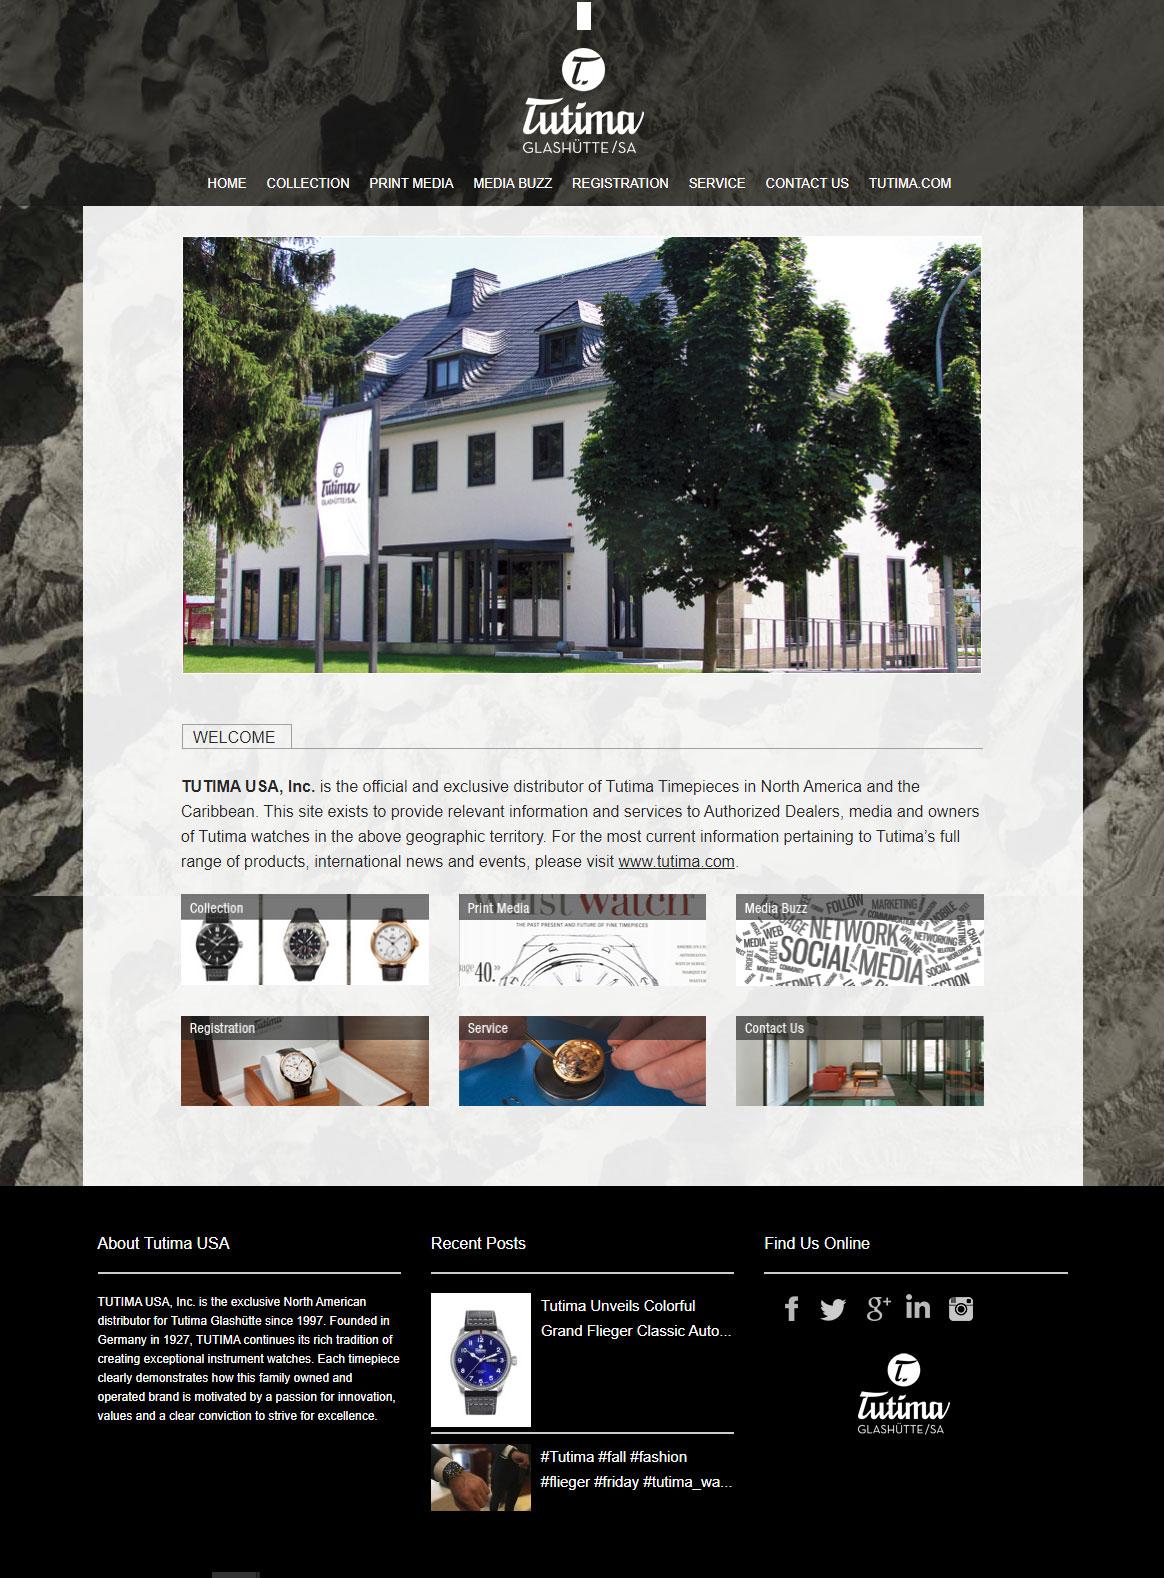 Tutima USA website customization